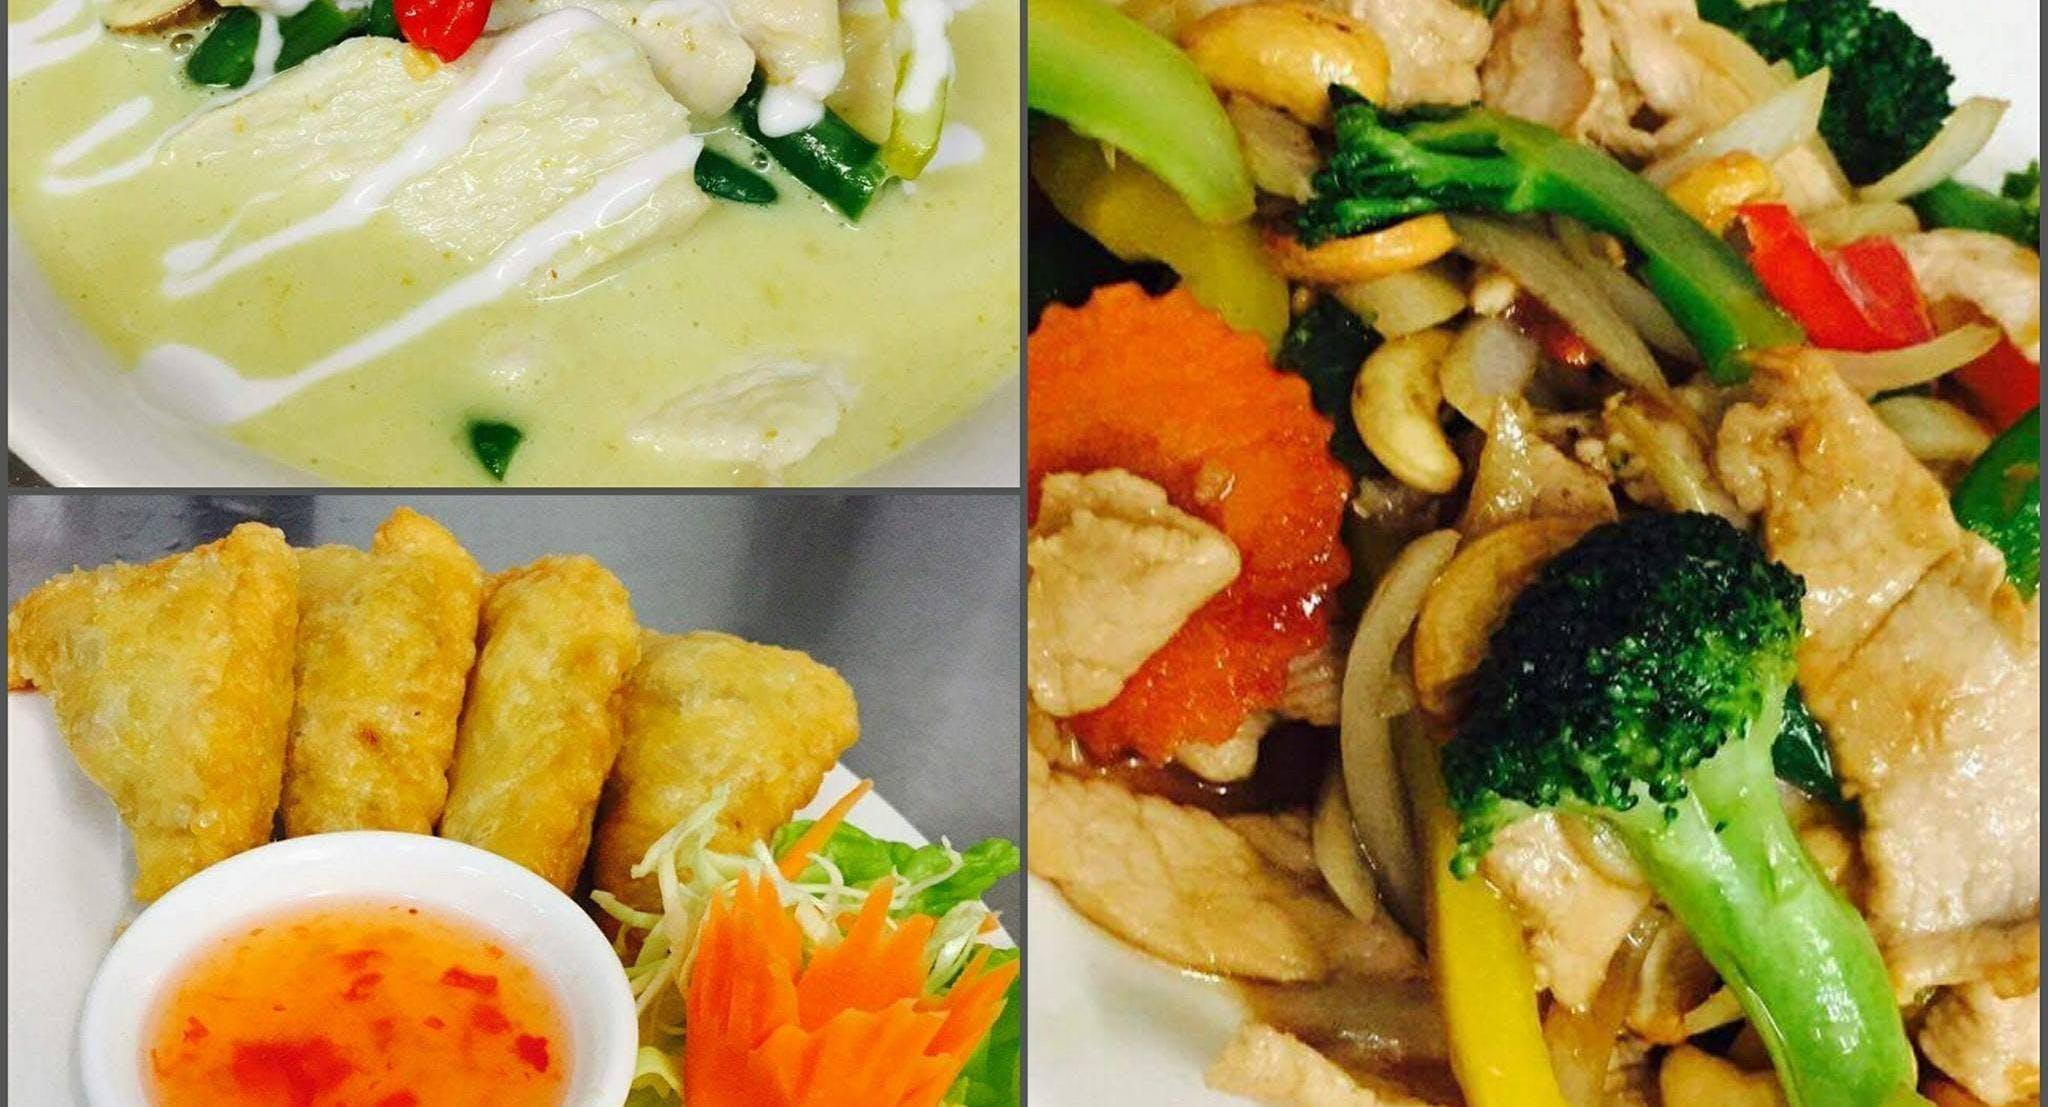 Royal Siam Kitchen